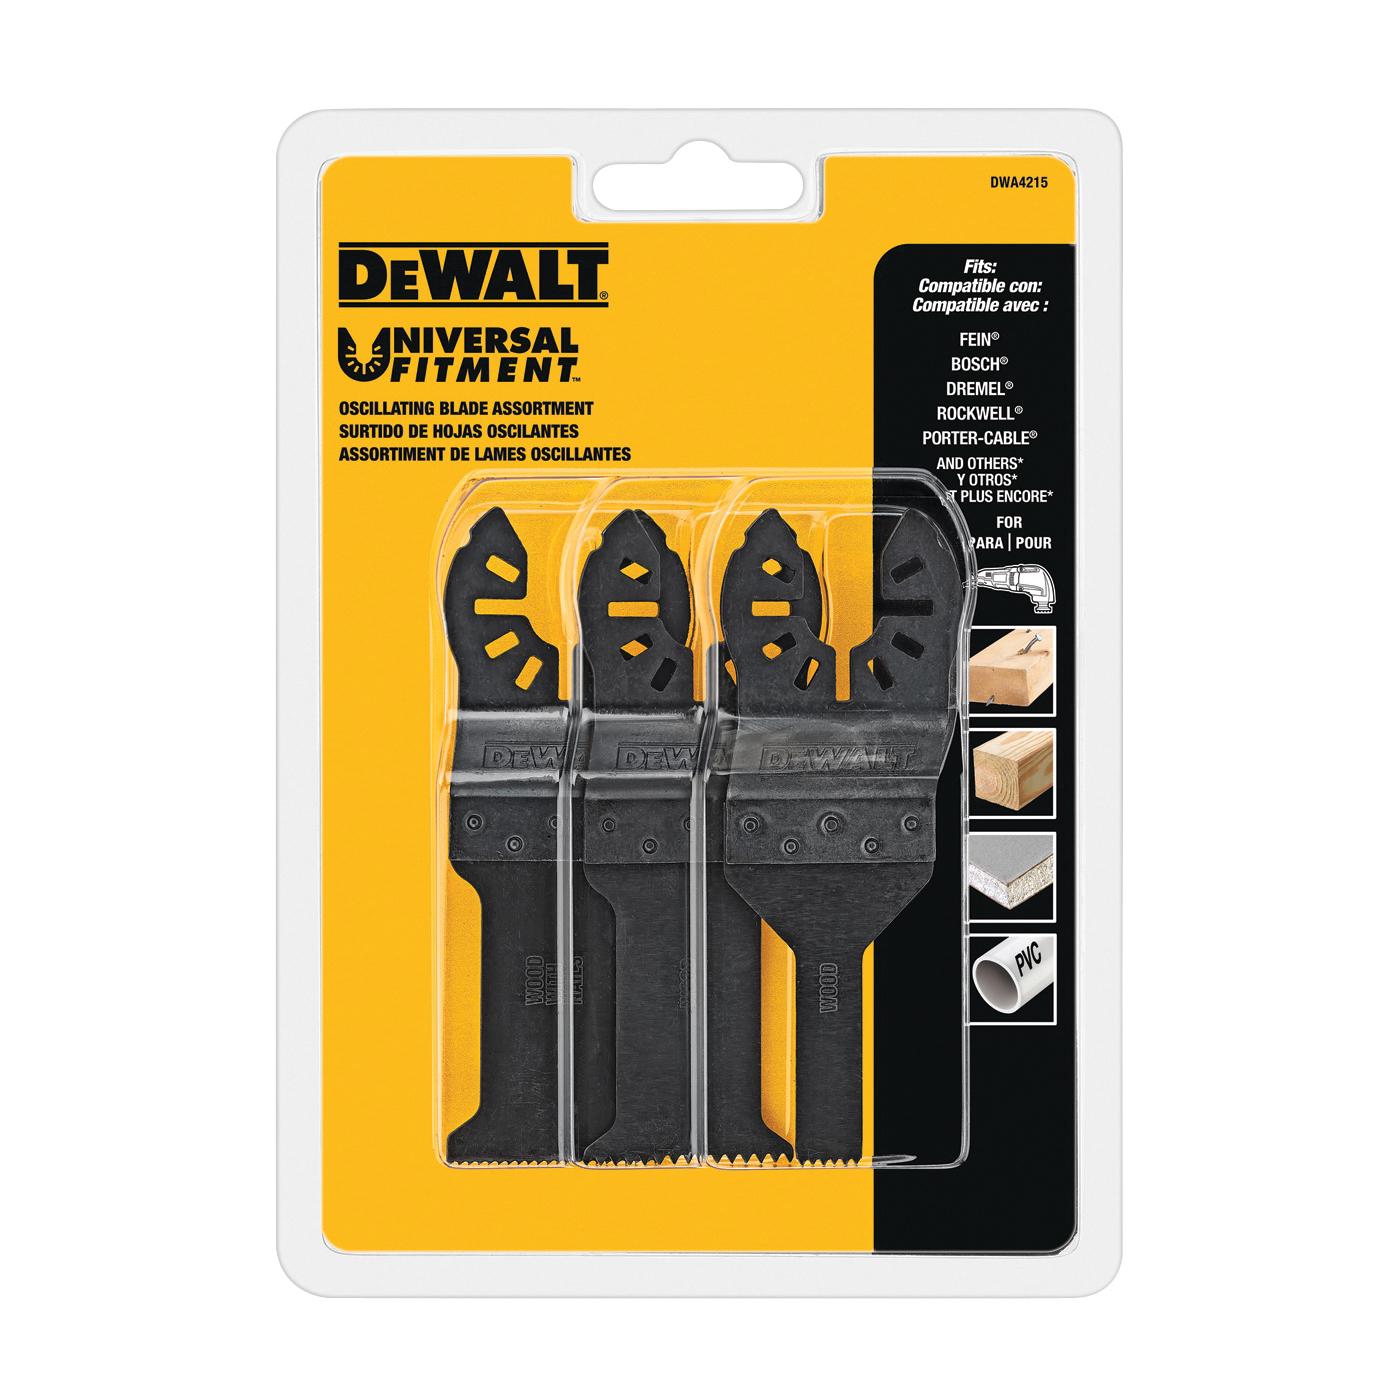 Picture of DeWALT DWA4215 Oscillating Blade Set, Steel